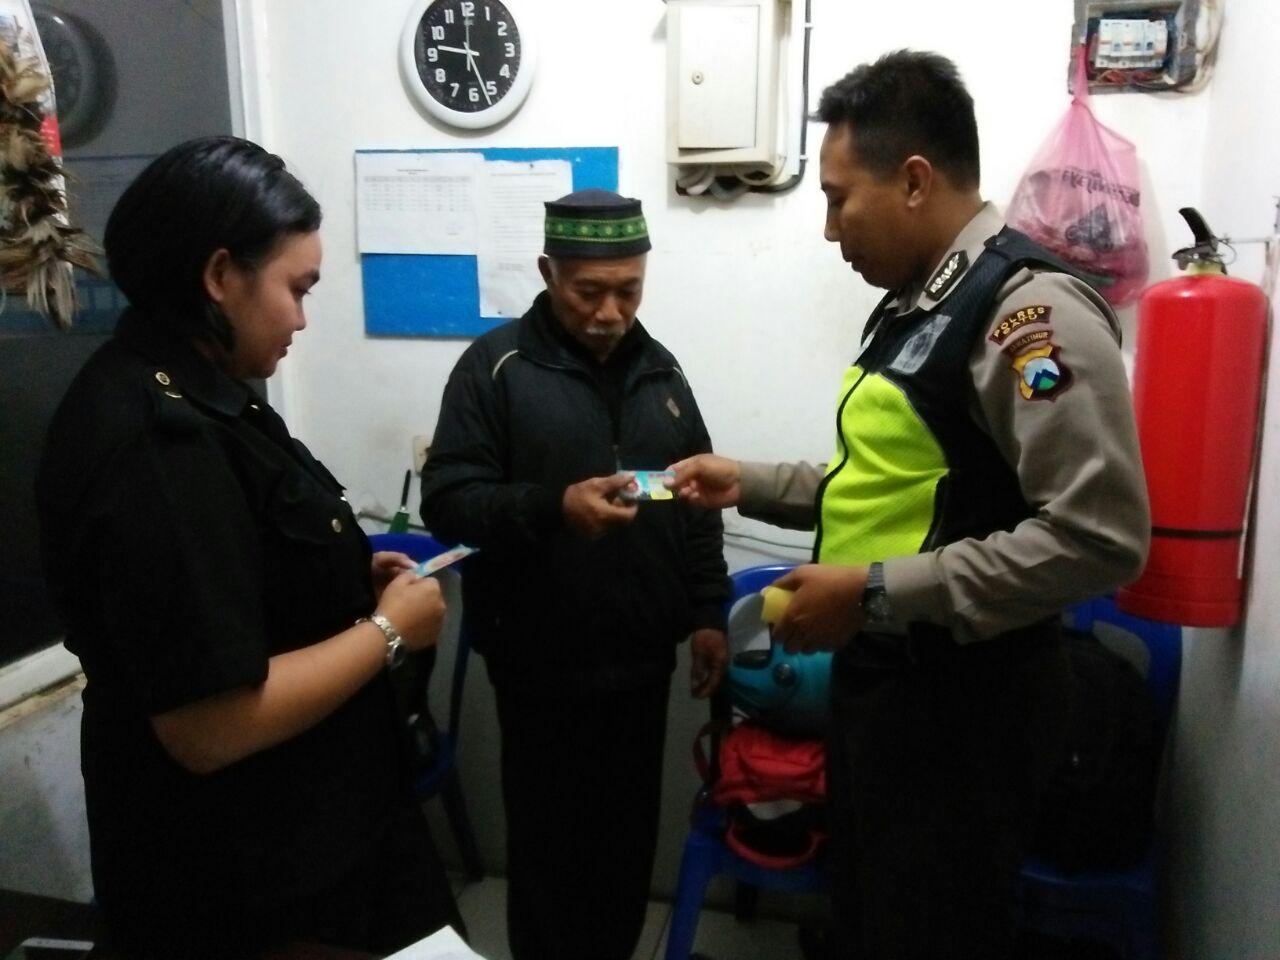 Patroli Sambang, Anggota Polsek Batu Polres Batu Kunjungan Tempat Usaha Sampaikan Pesan Kamtibmas